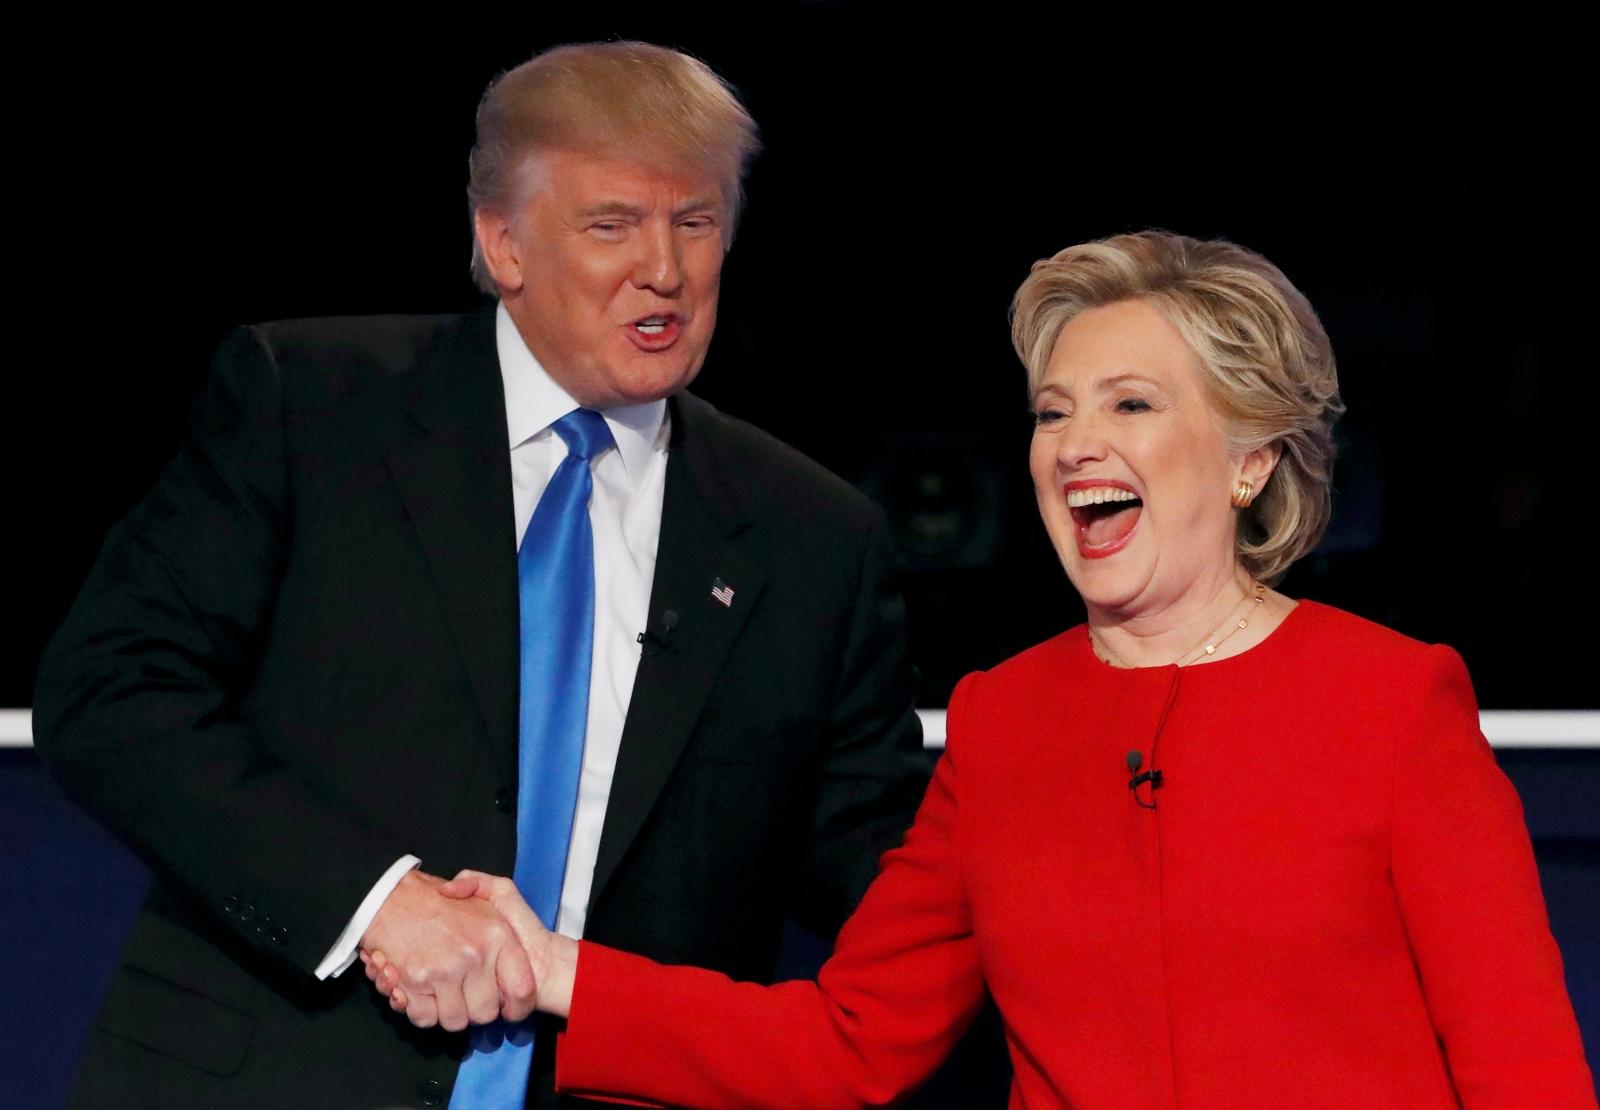 Presidential debate Donald Trump and Hillary Clinton